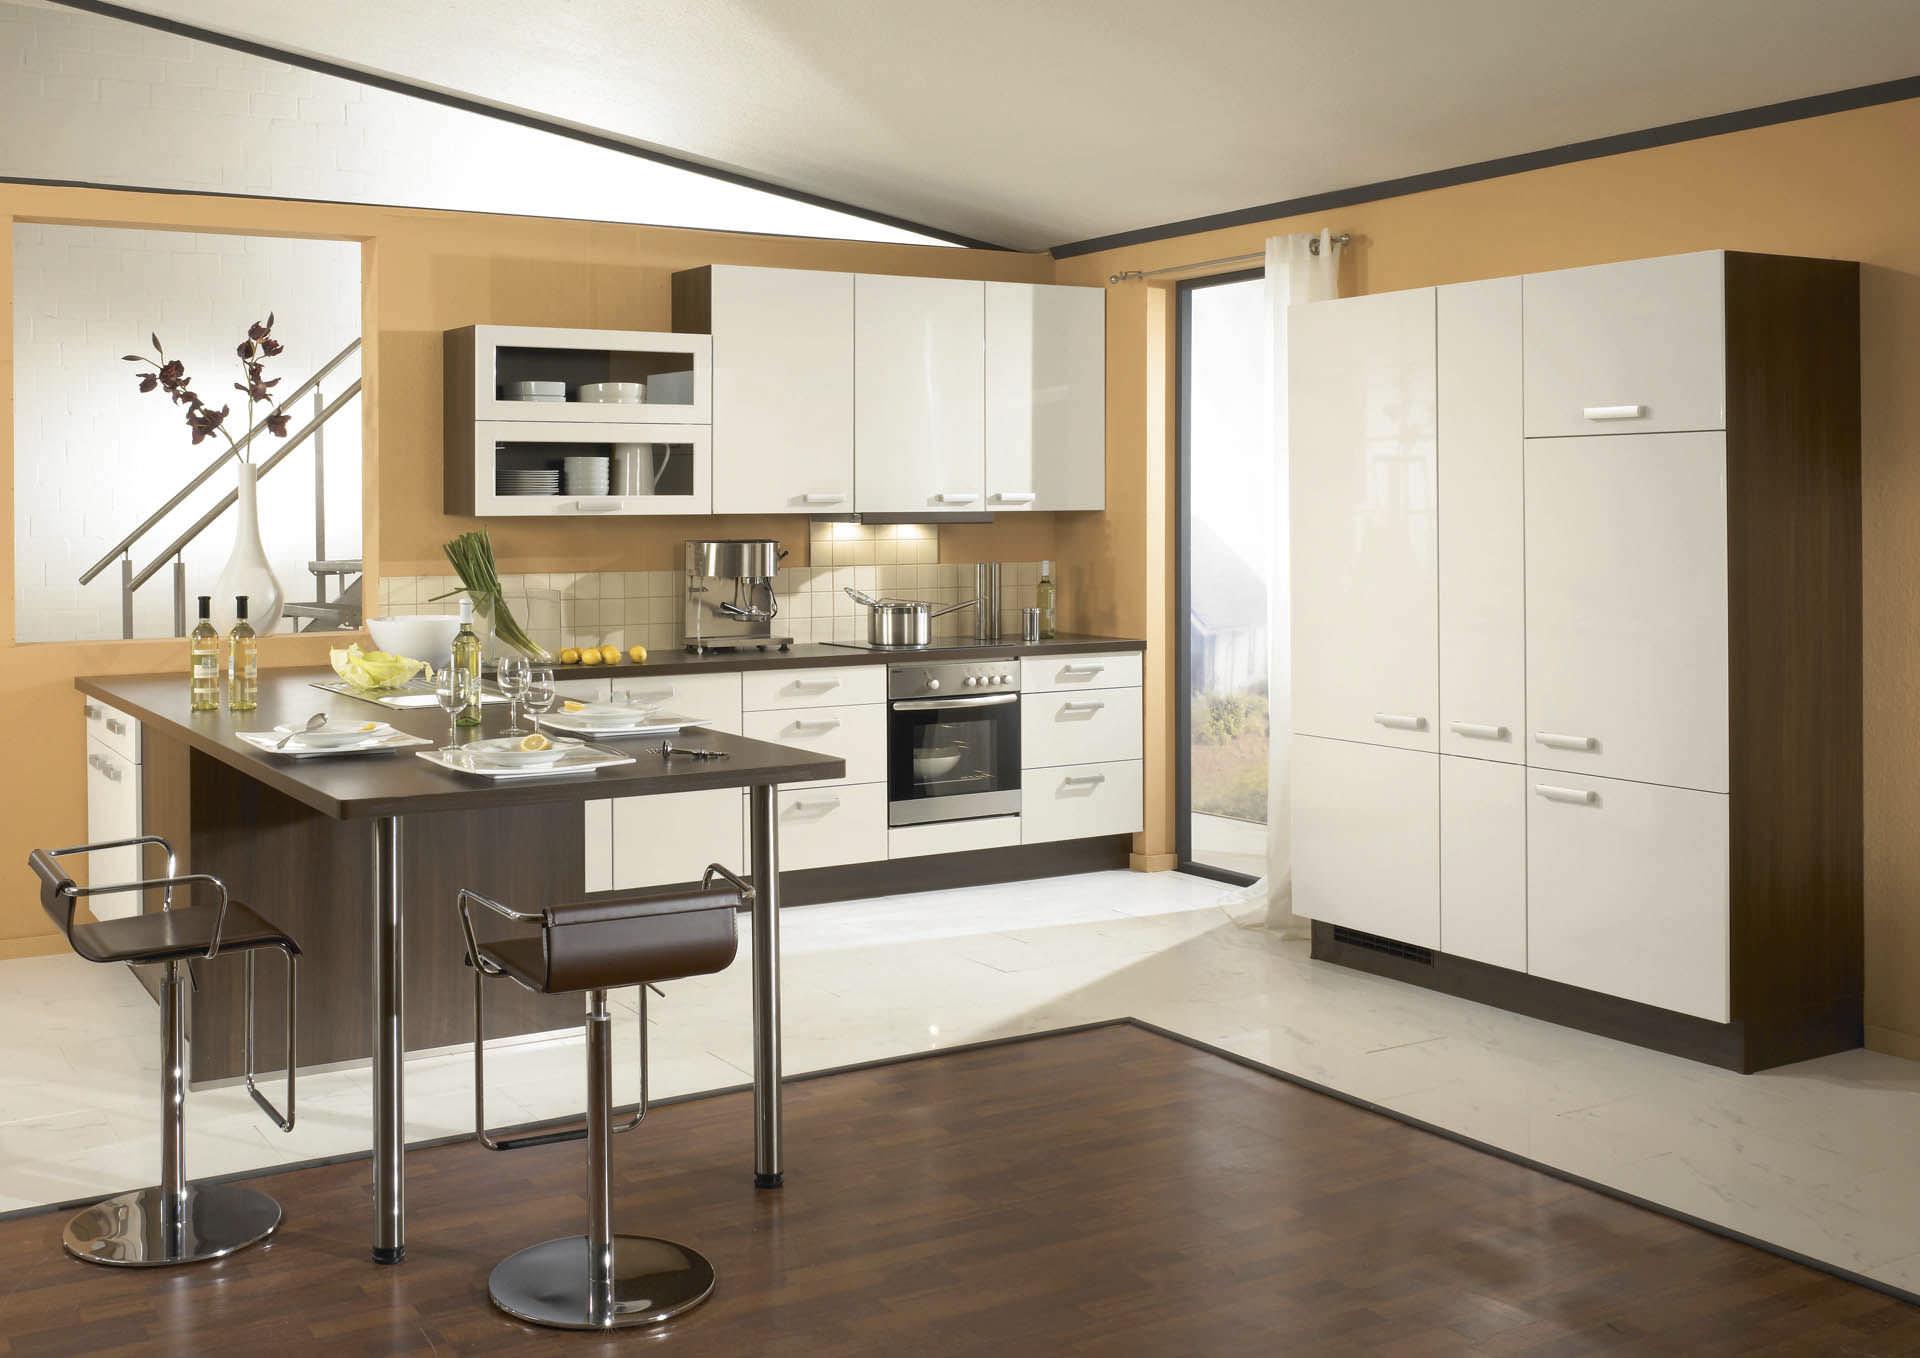 Moderne Küche / Holzfurnier / lackiert - PRIMO 704 - nobilia